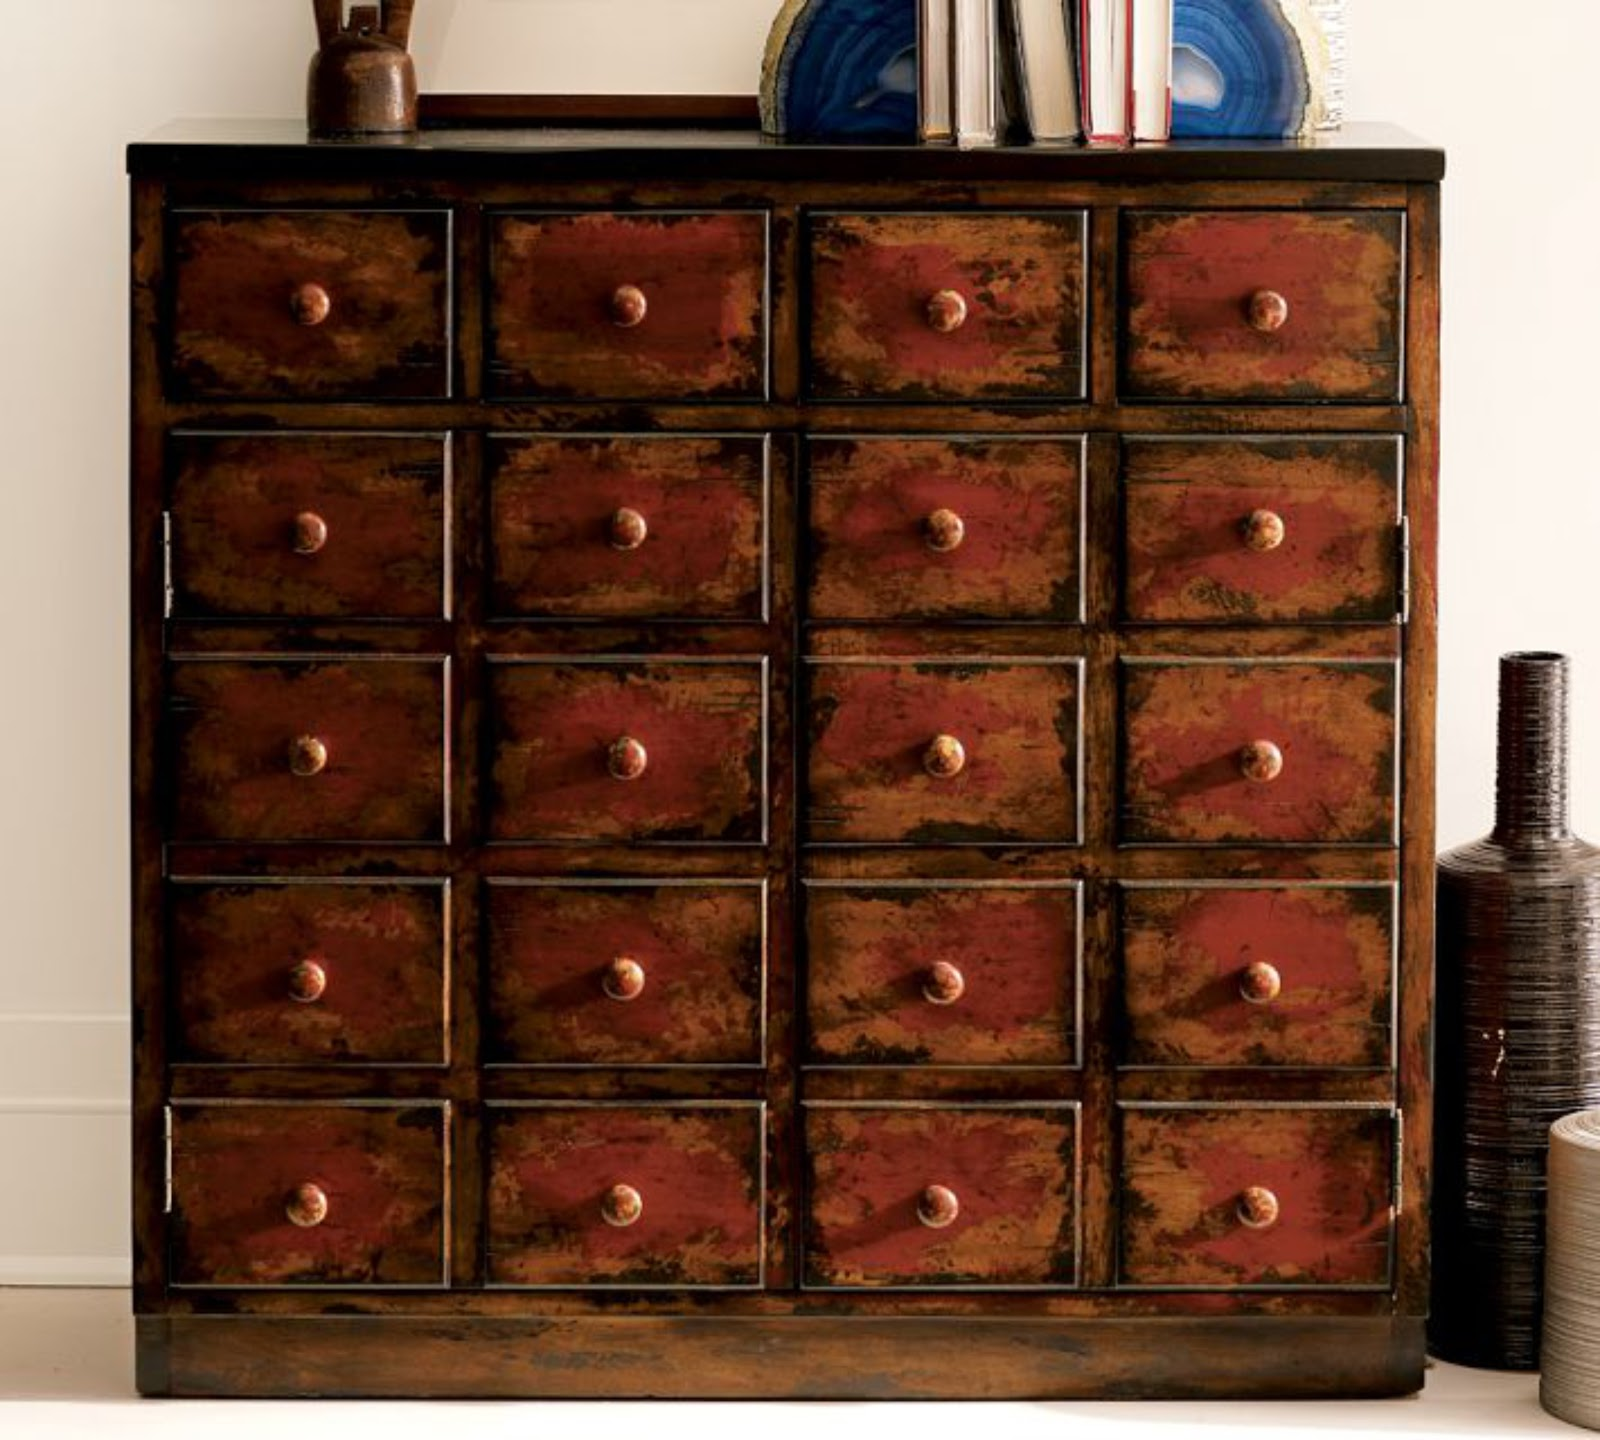 J Thaddeus Ozark S Cookie Jars And Other Larks Cabinets